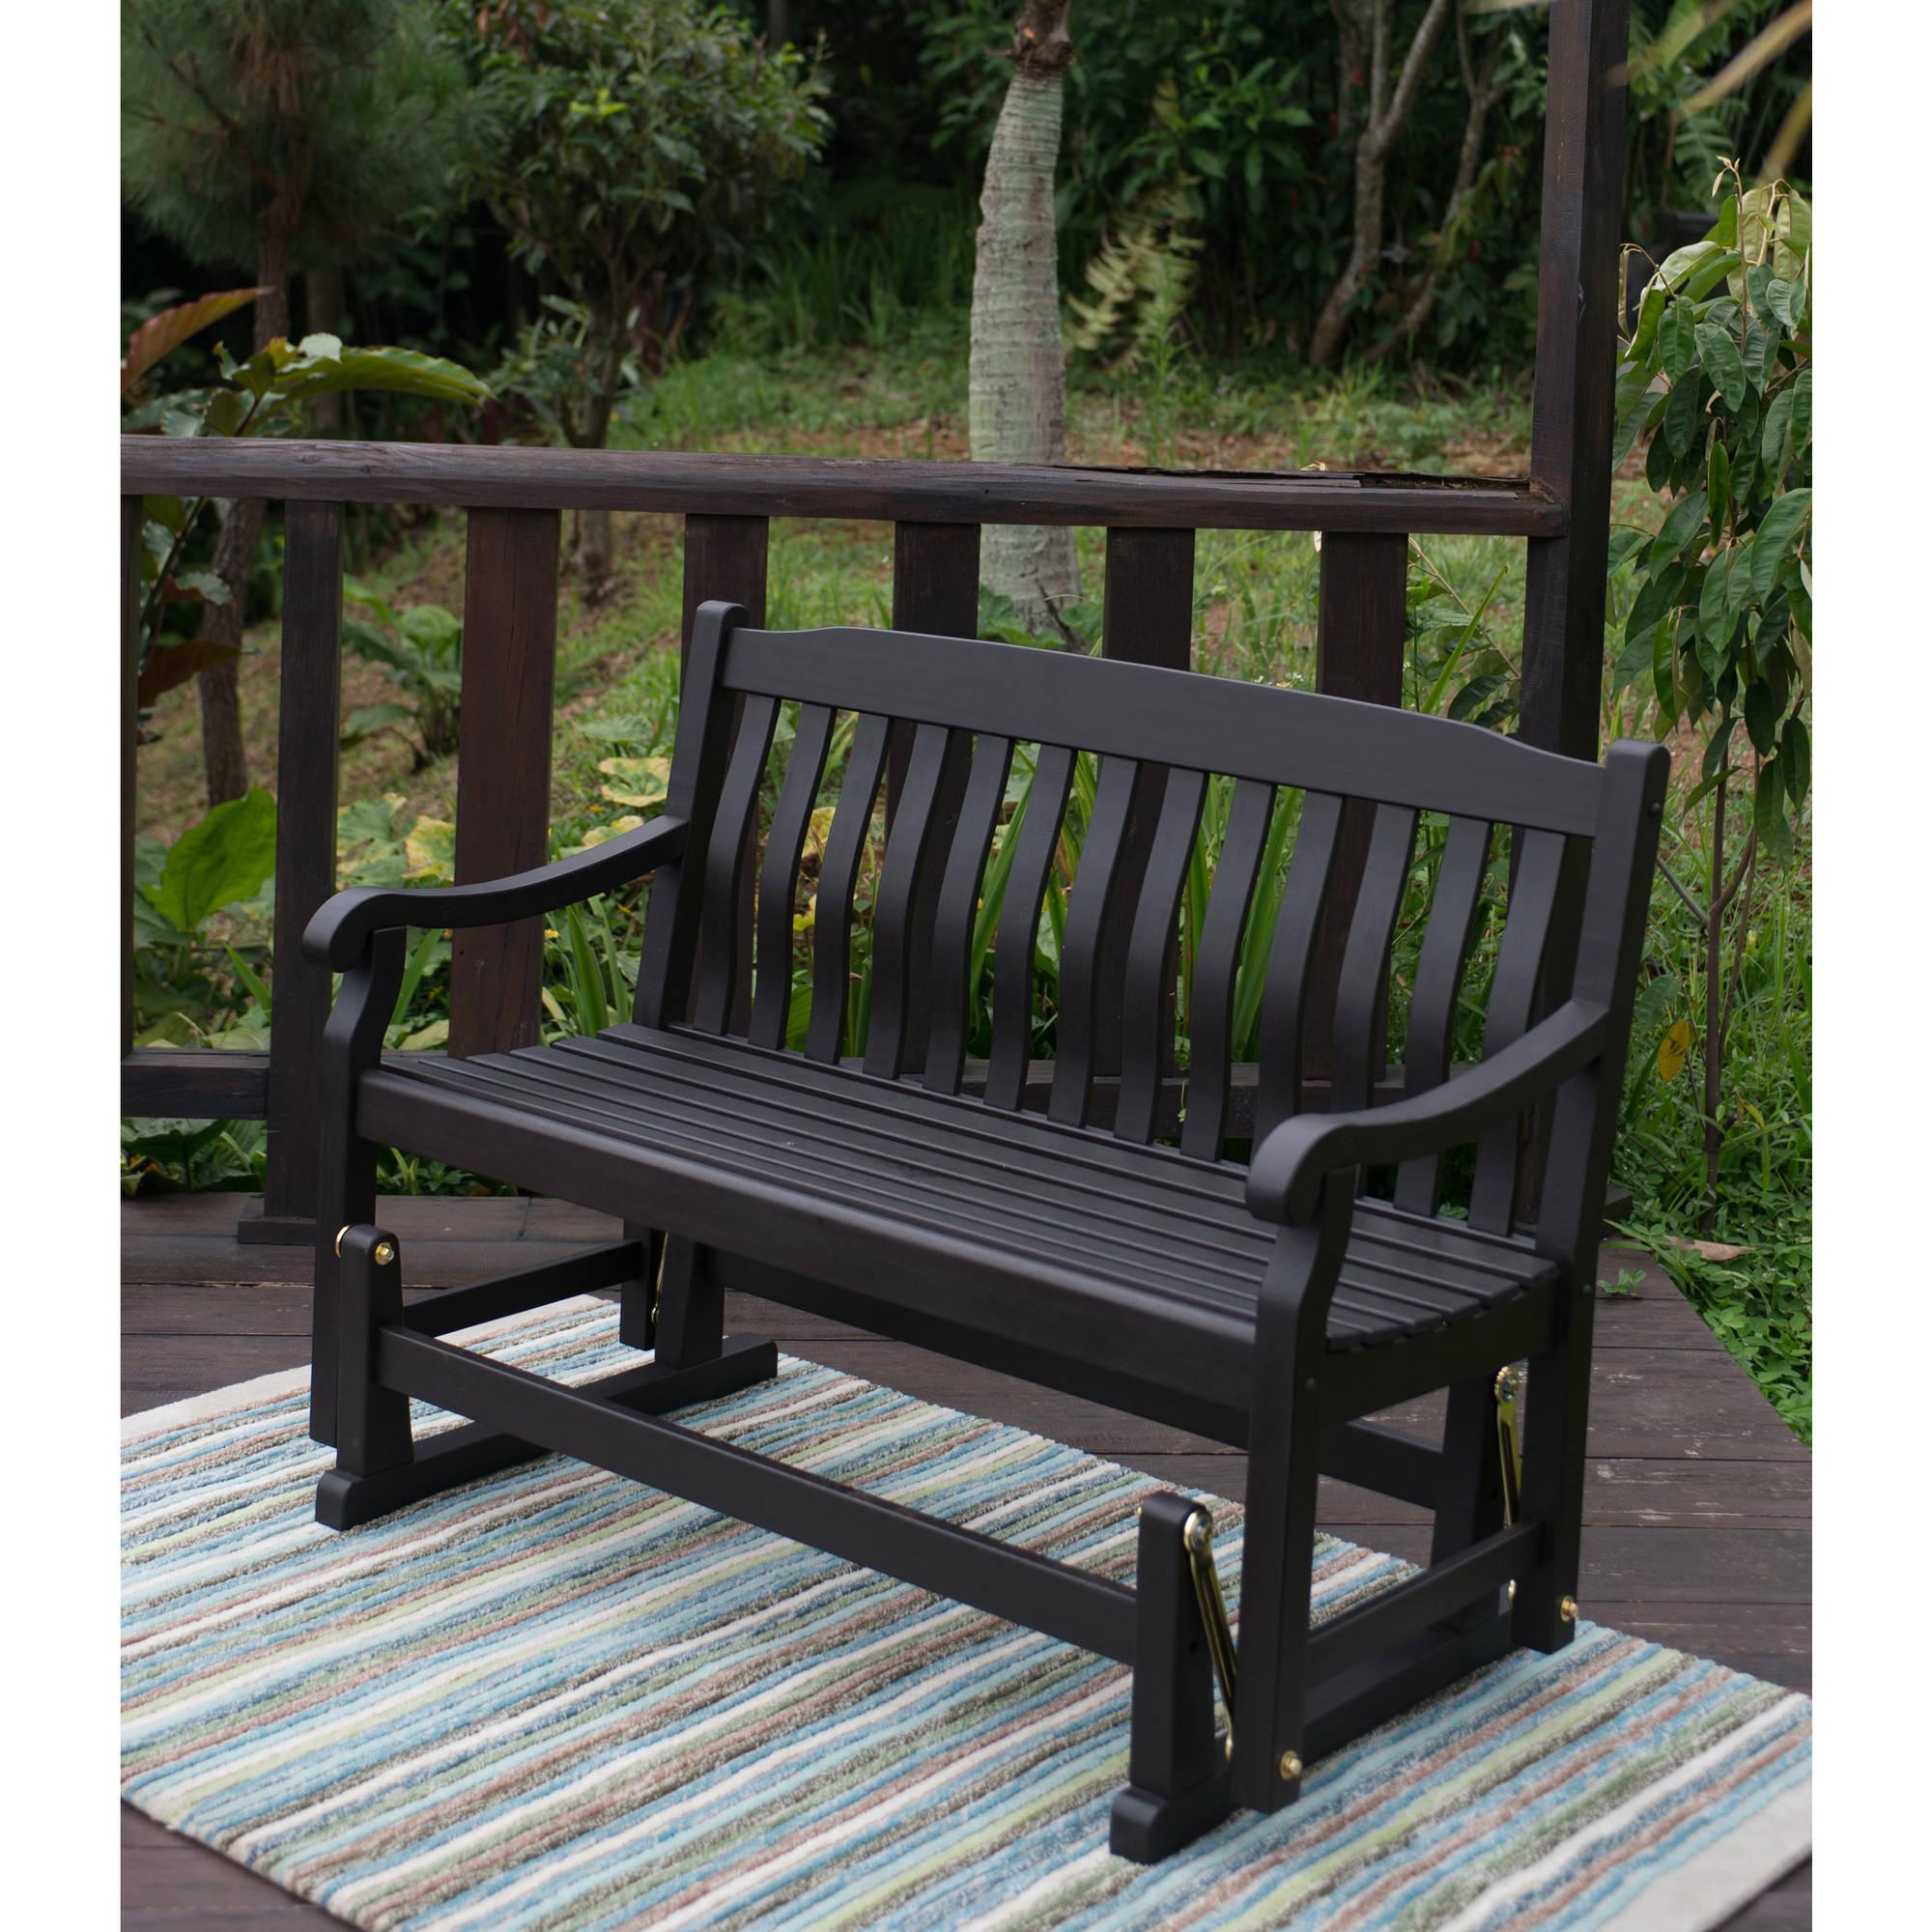 Hardwood Porch Glider Benches Intended For Most Recent Better Homes & Gardens Delahey Outdoor Glider Bench, Dark Brown – Walmart (View 17 of 30)